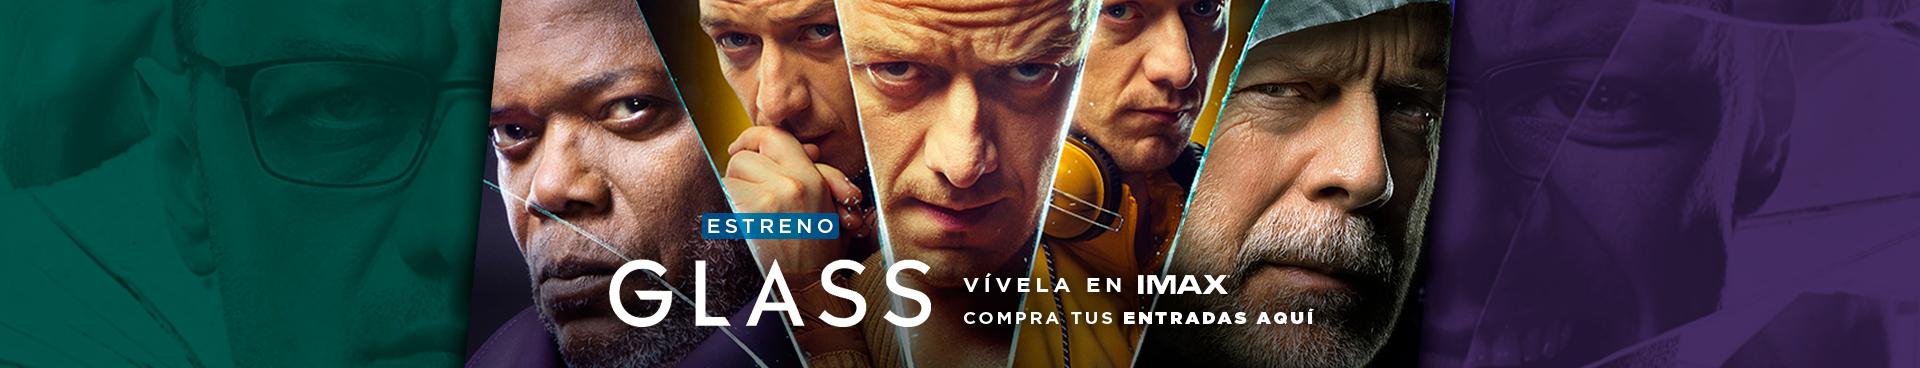 ESTRENO GLASS, VÍVELA EN IMAX, COMPRA TU ENTRADAS AQUÍ